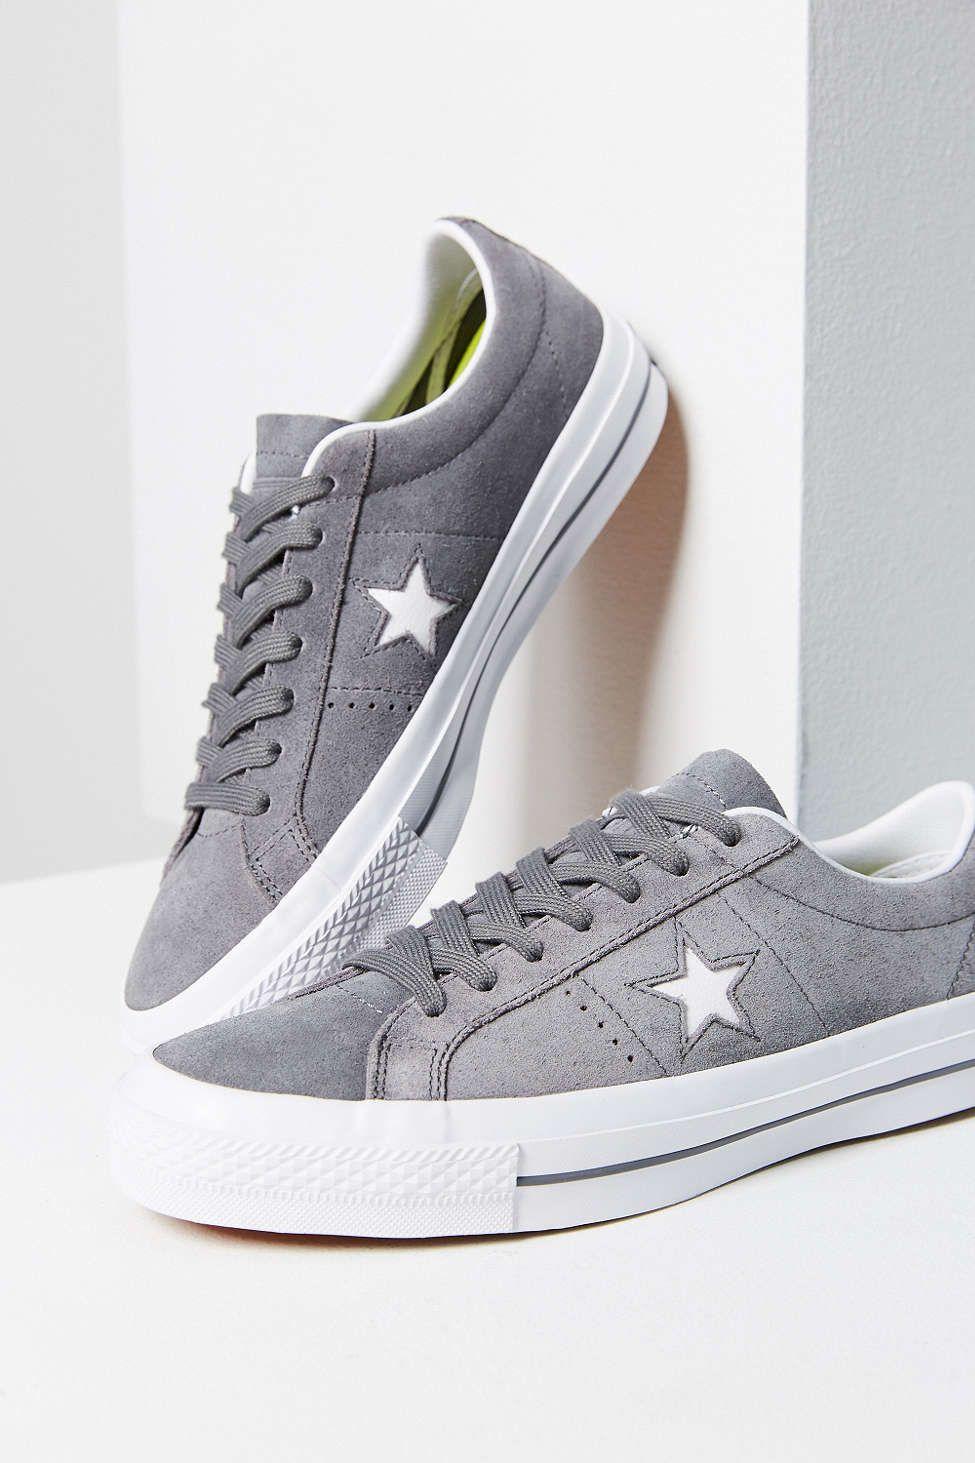 Converse One Star Premium Suede Sneaker  3335e964ab